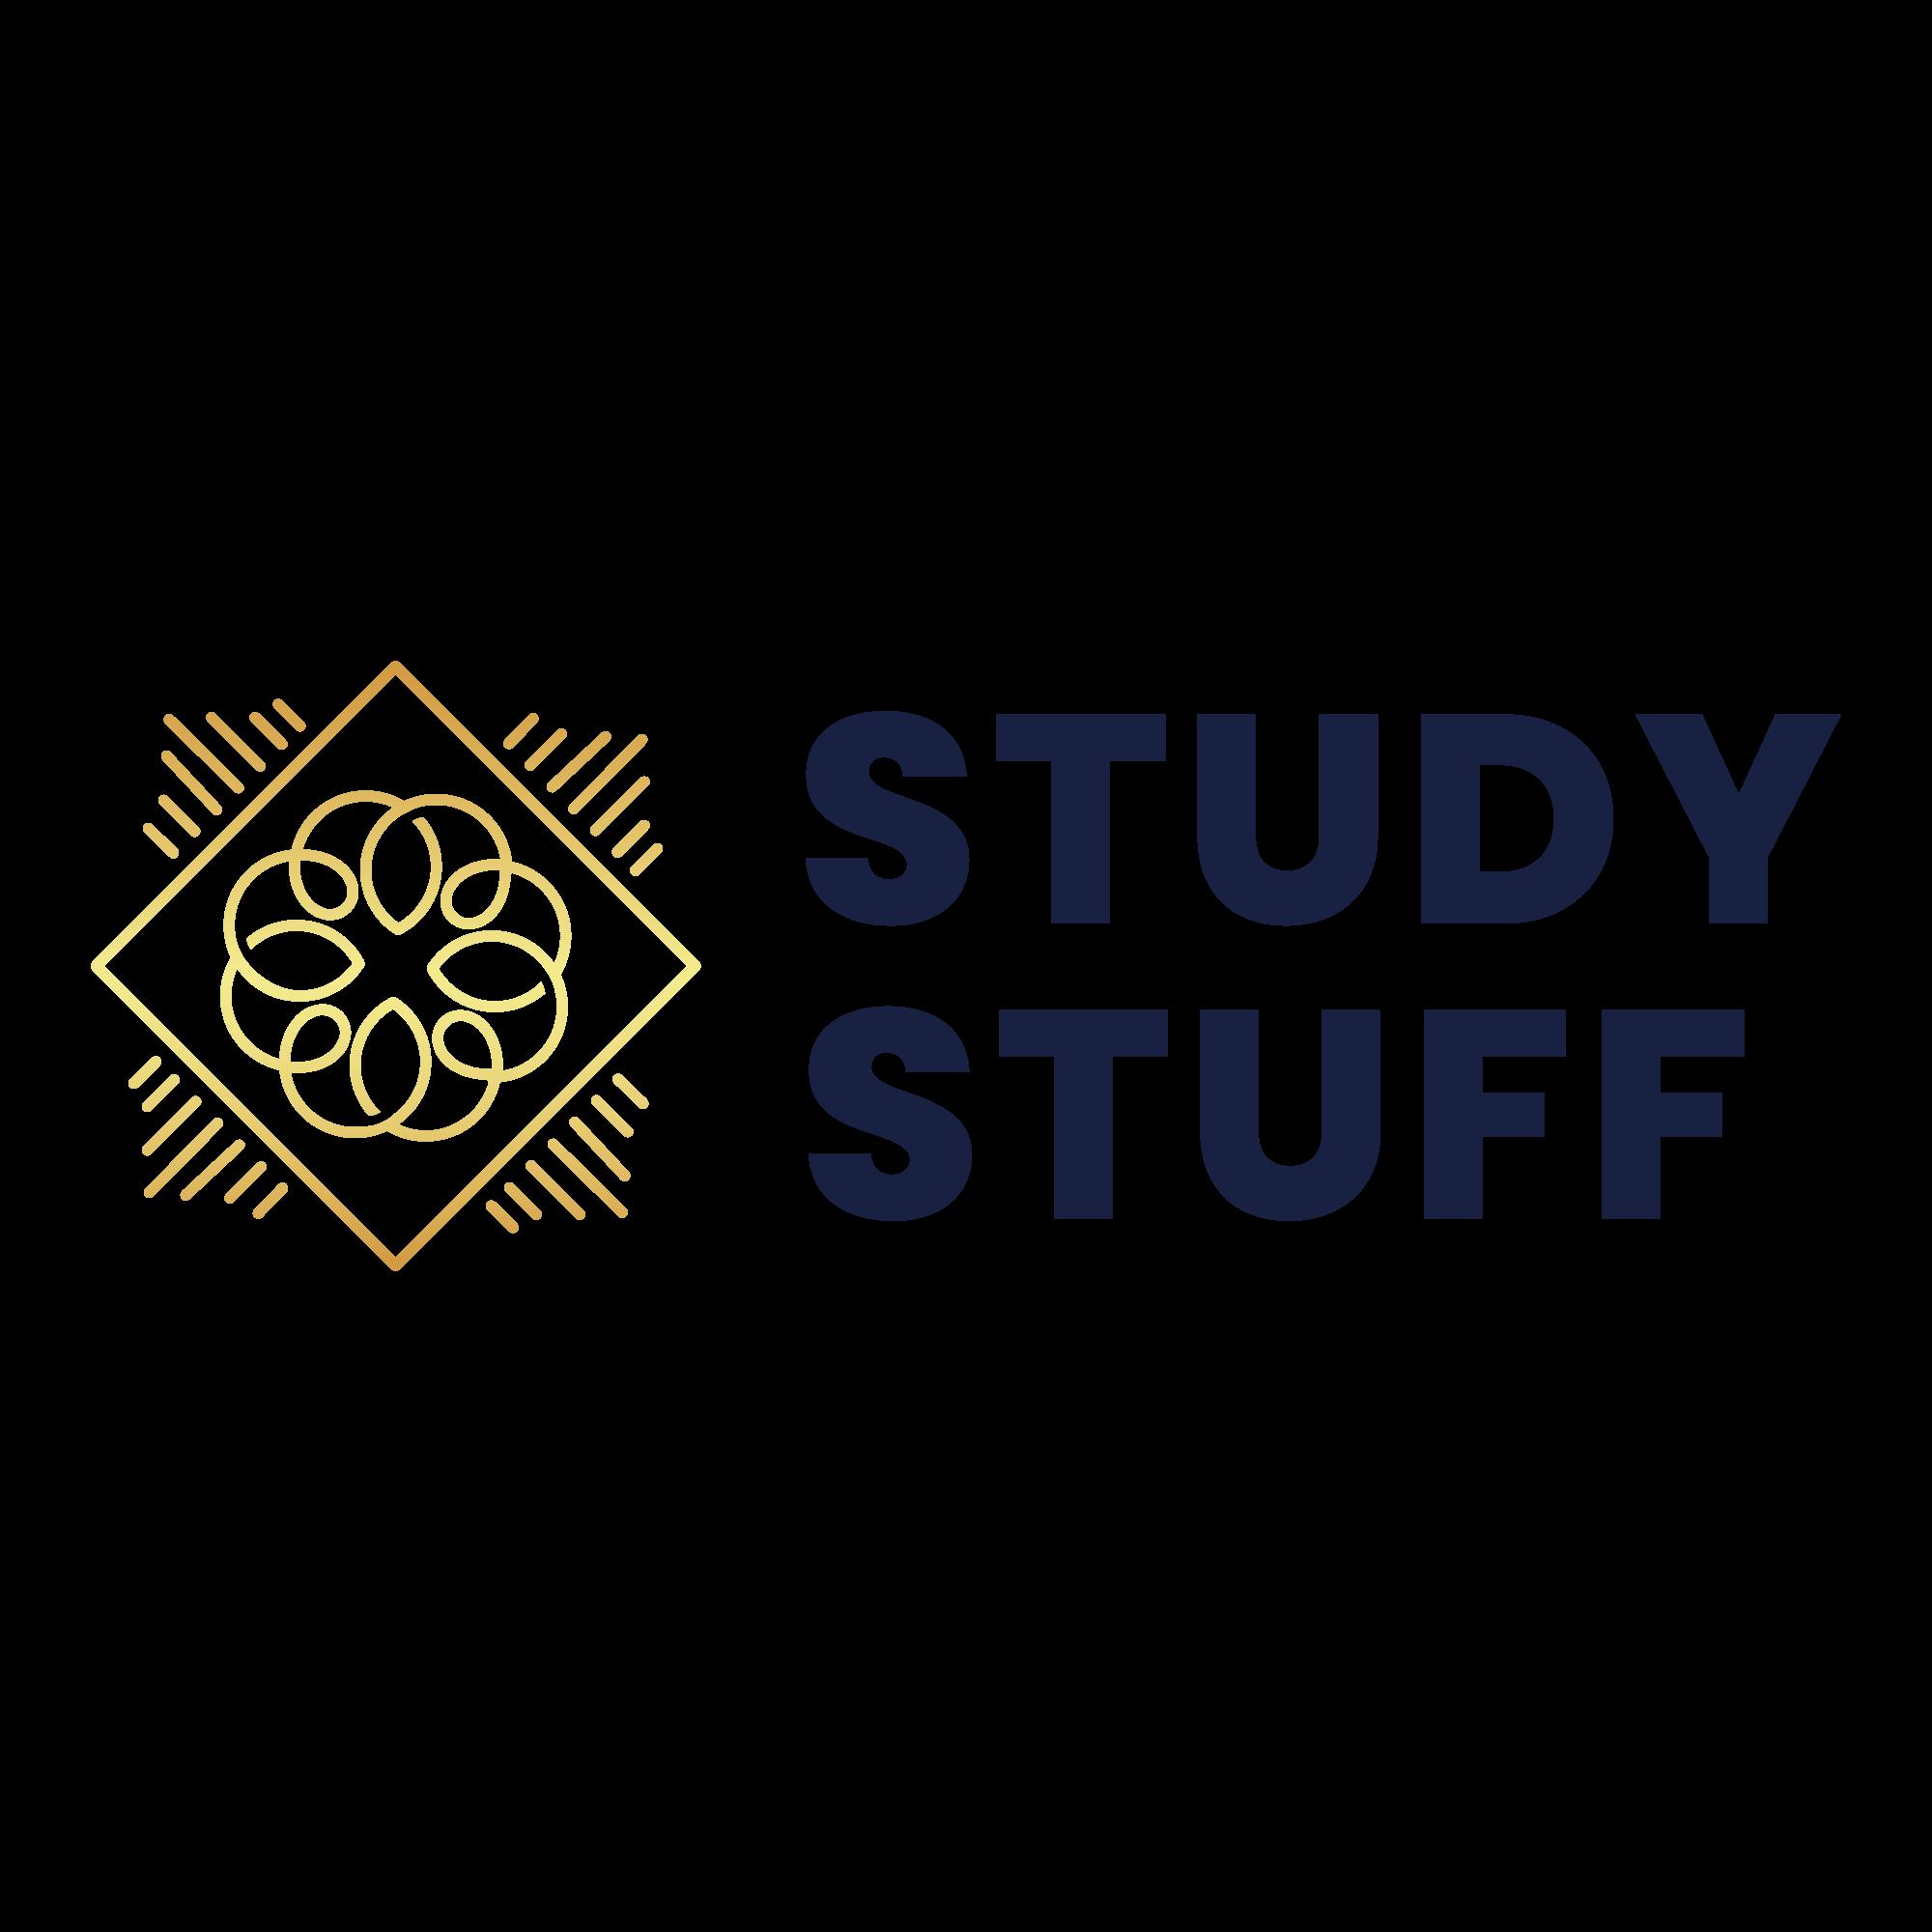 Study Stuff